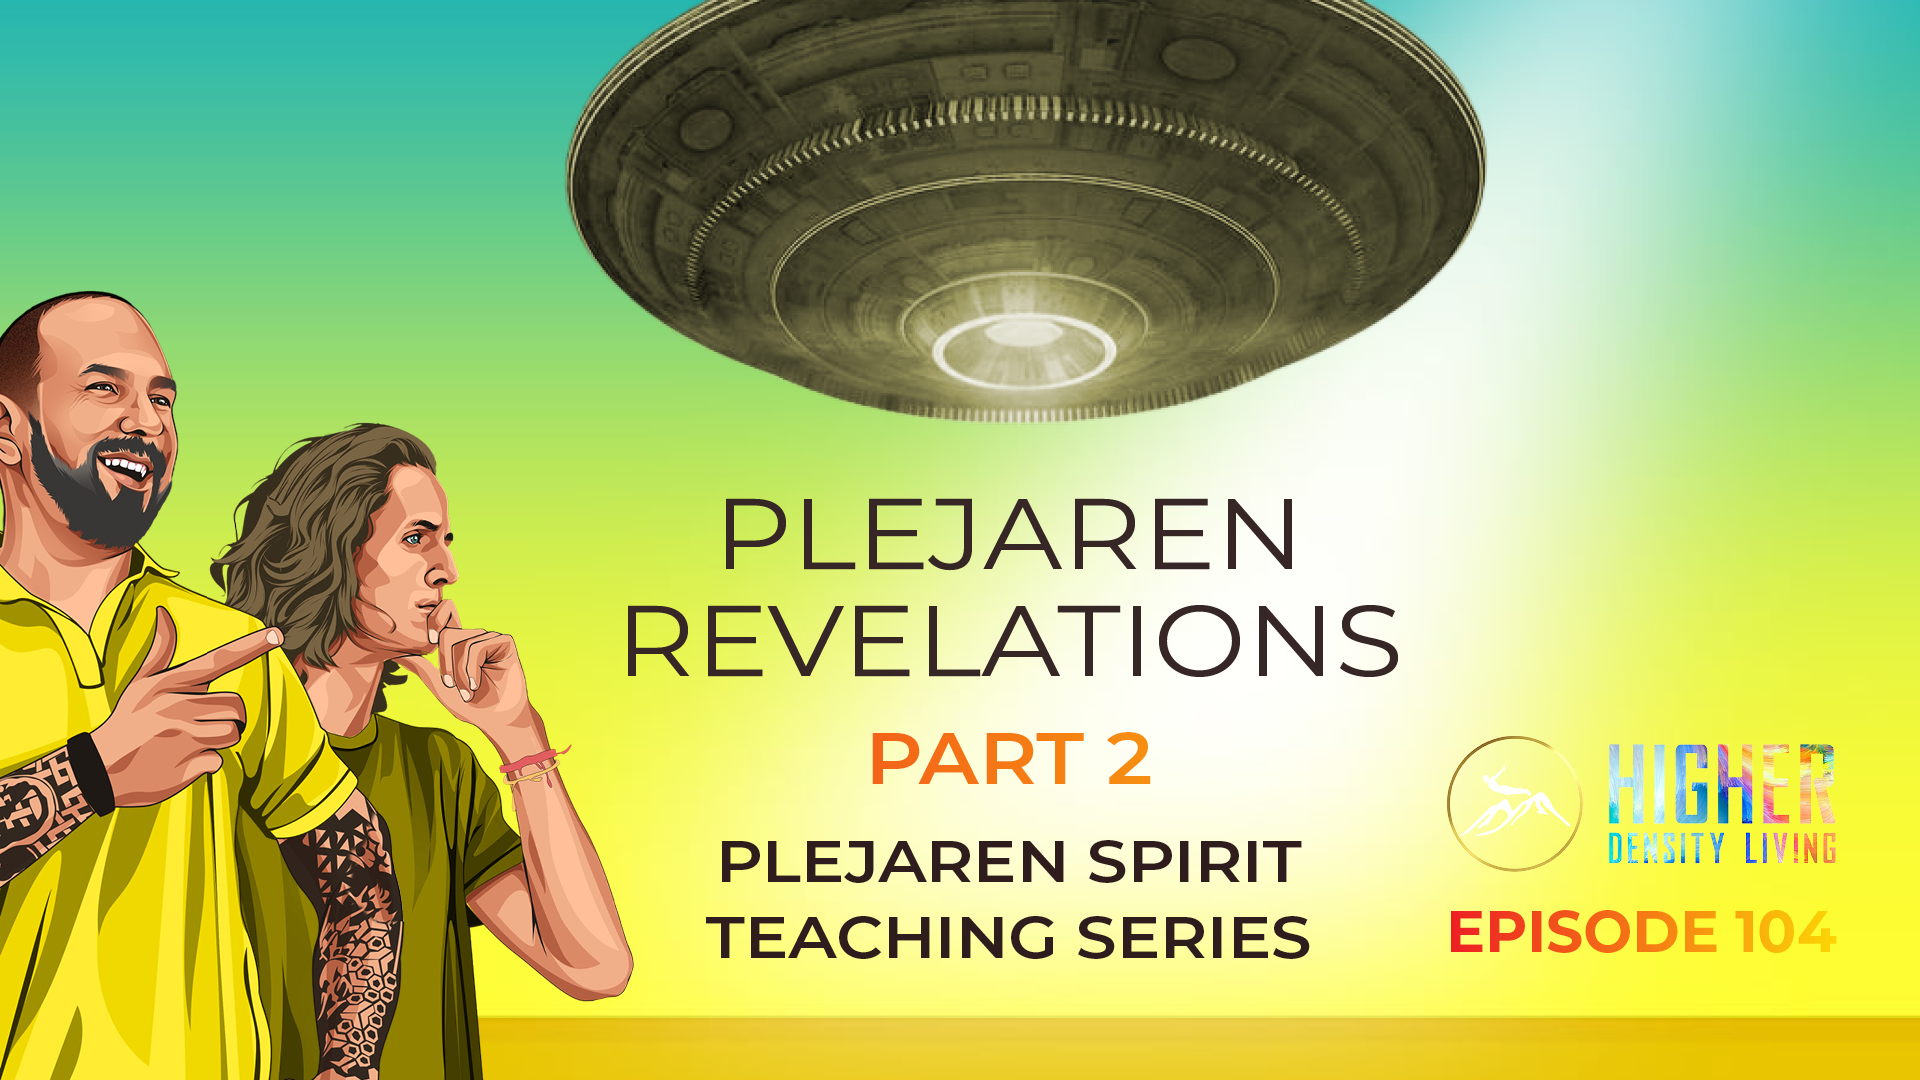 Plejaren Revelations Part 2 - Plejaren Spirit Teaching Series